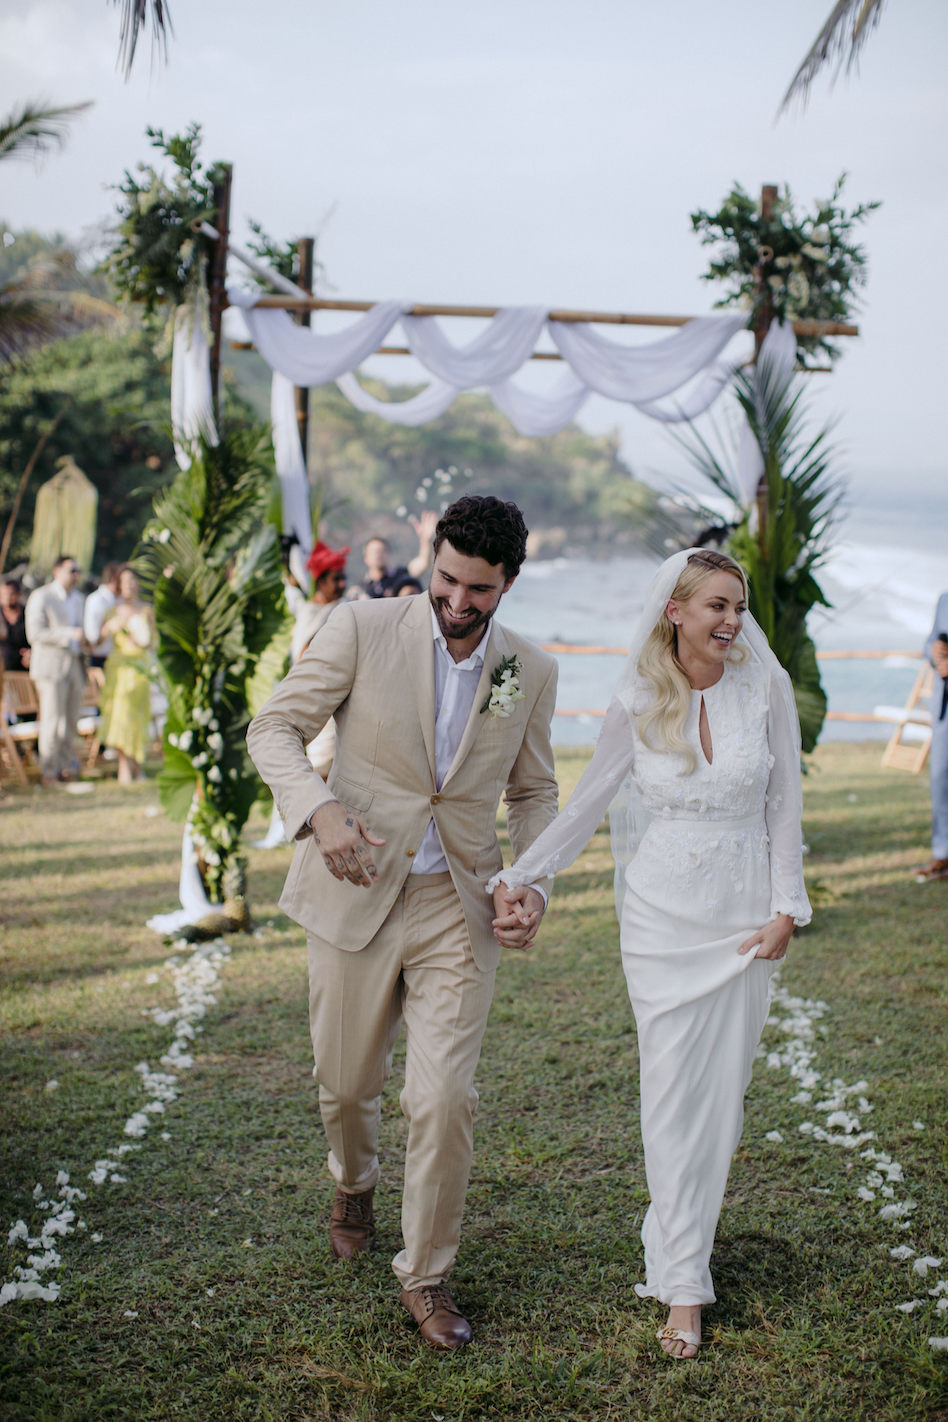 kaitlyn_brody_wedding-654.jpg